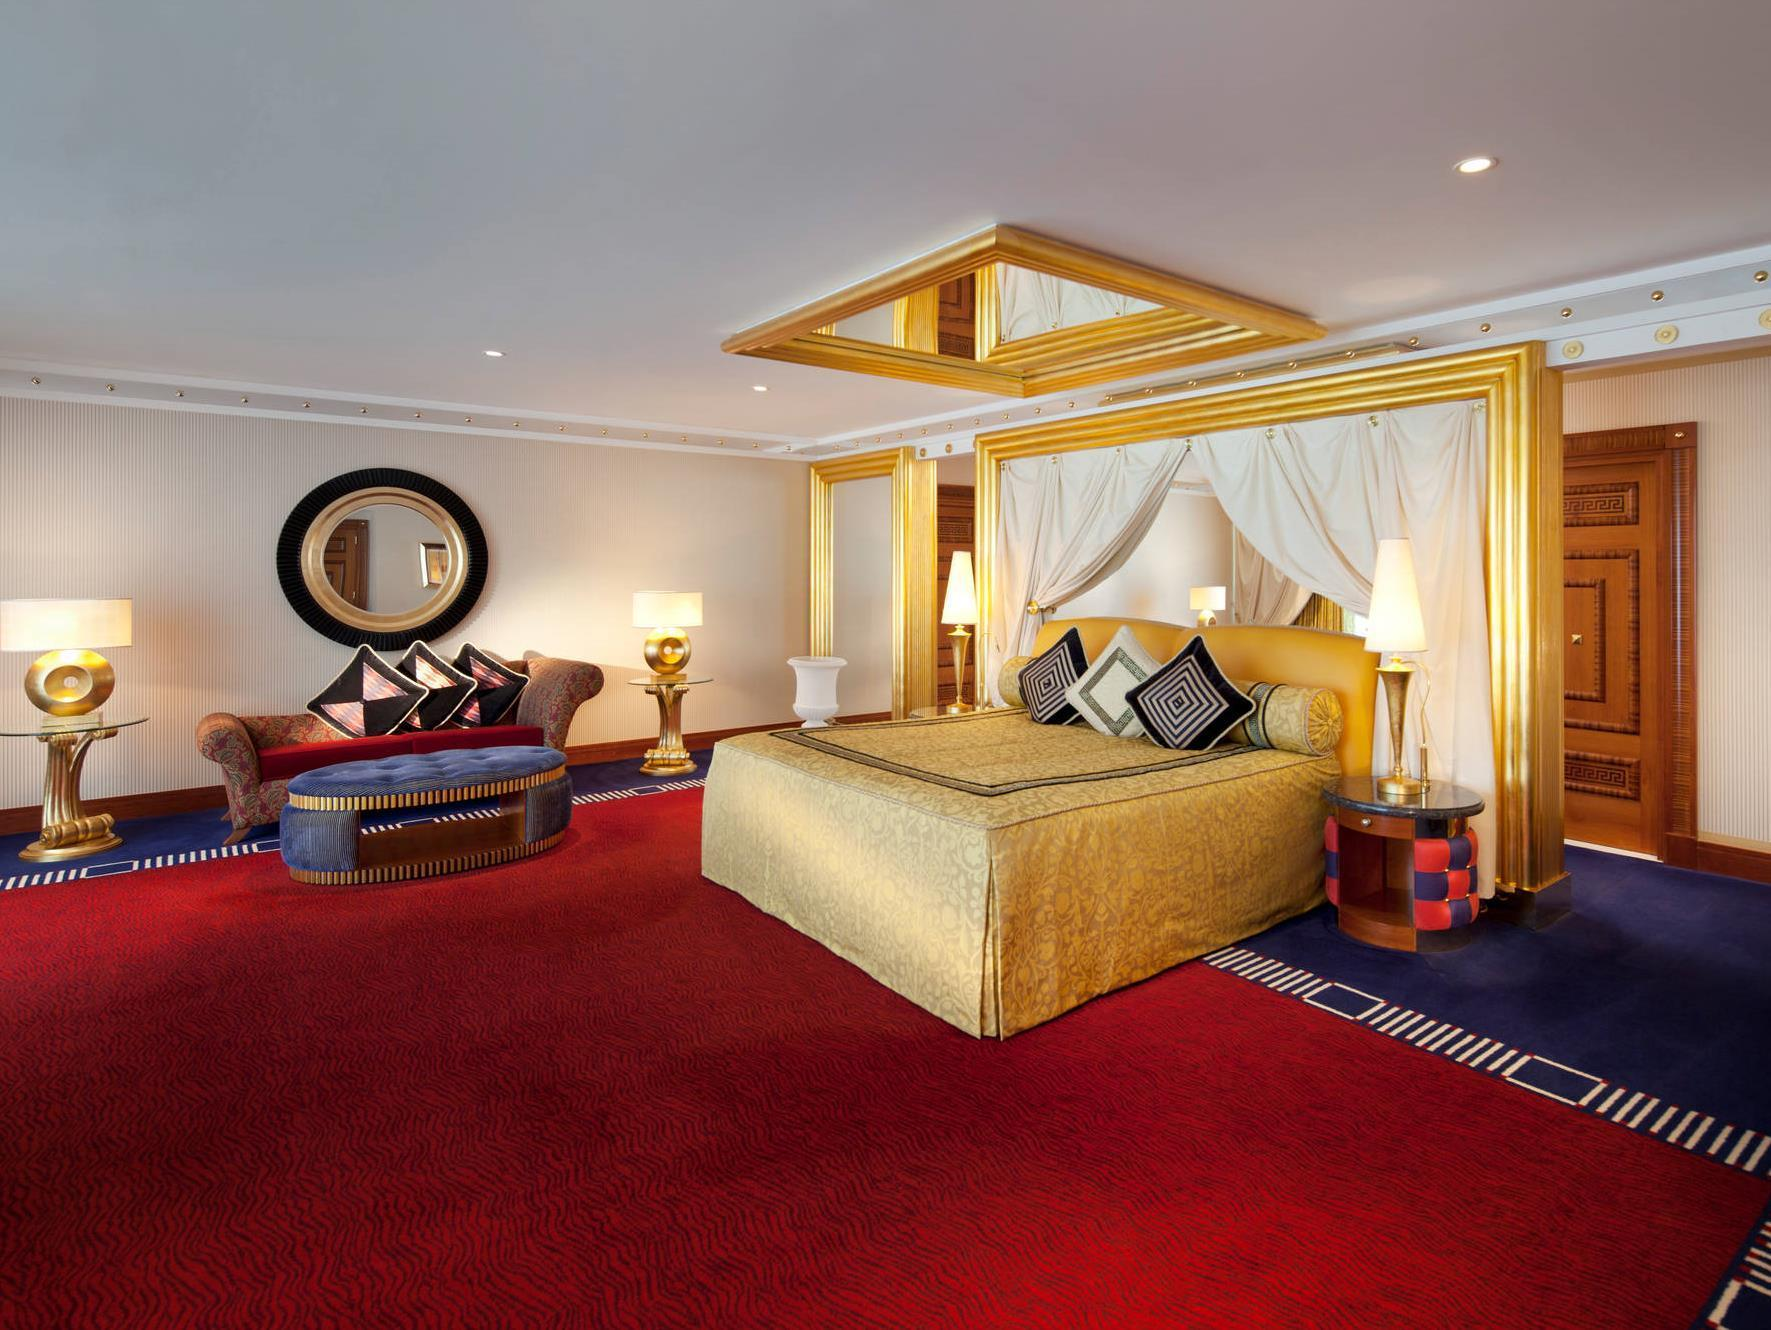 Burj Al Arab Jumeirah Resort (Dubai